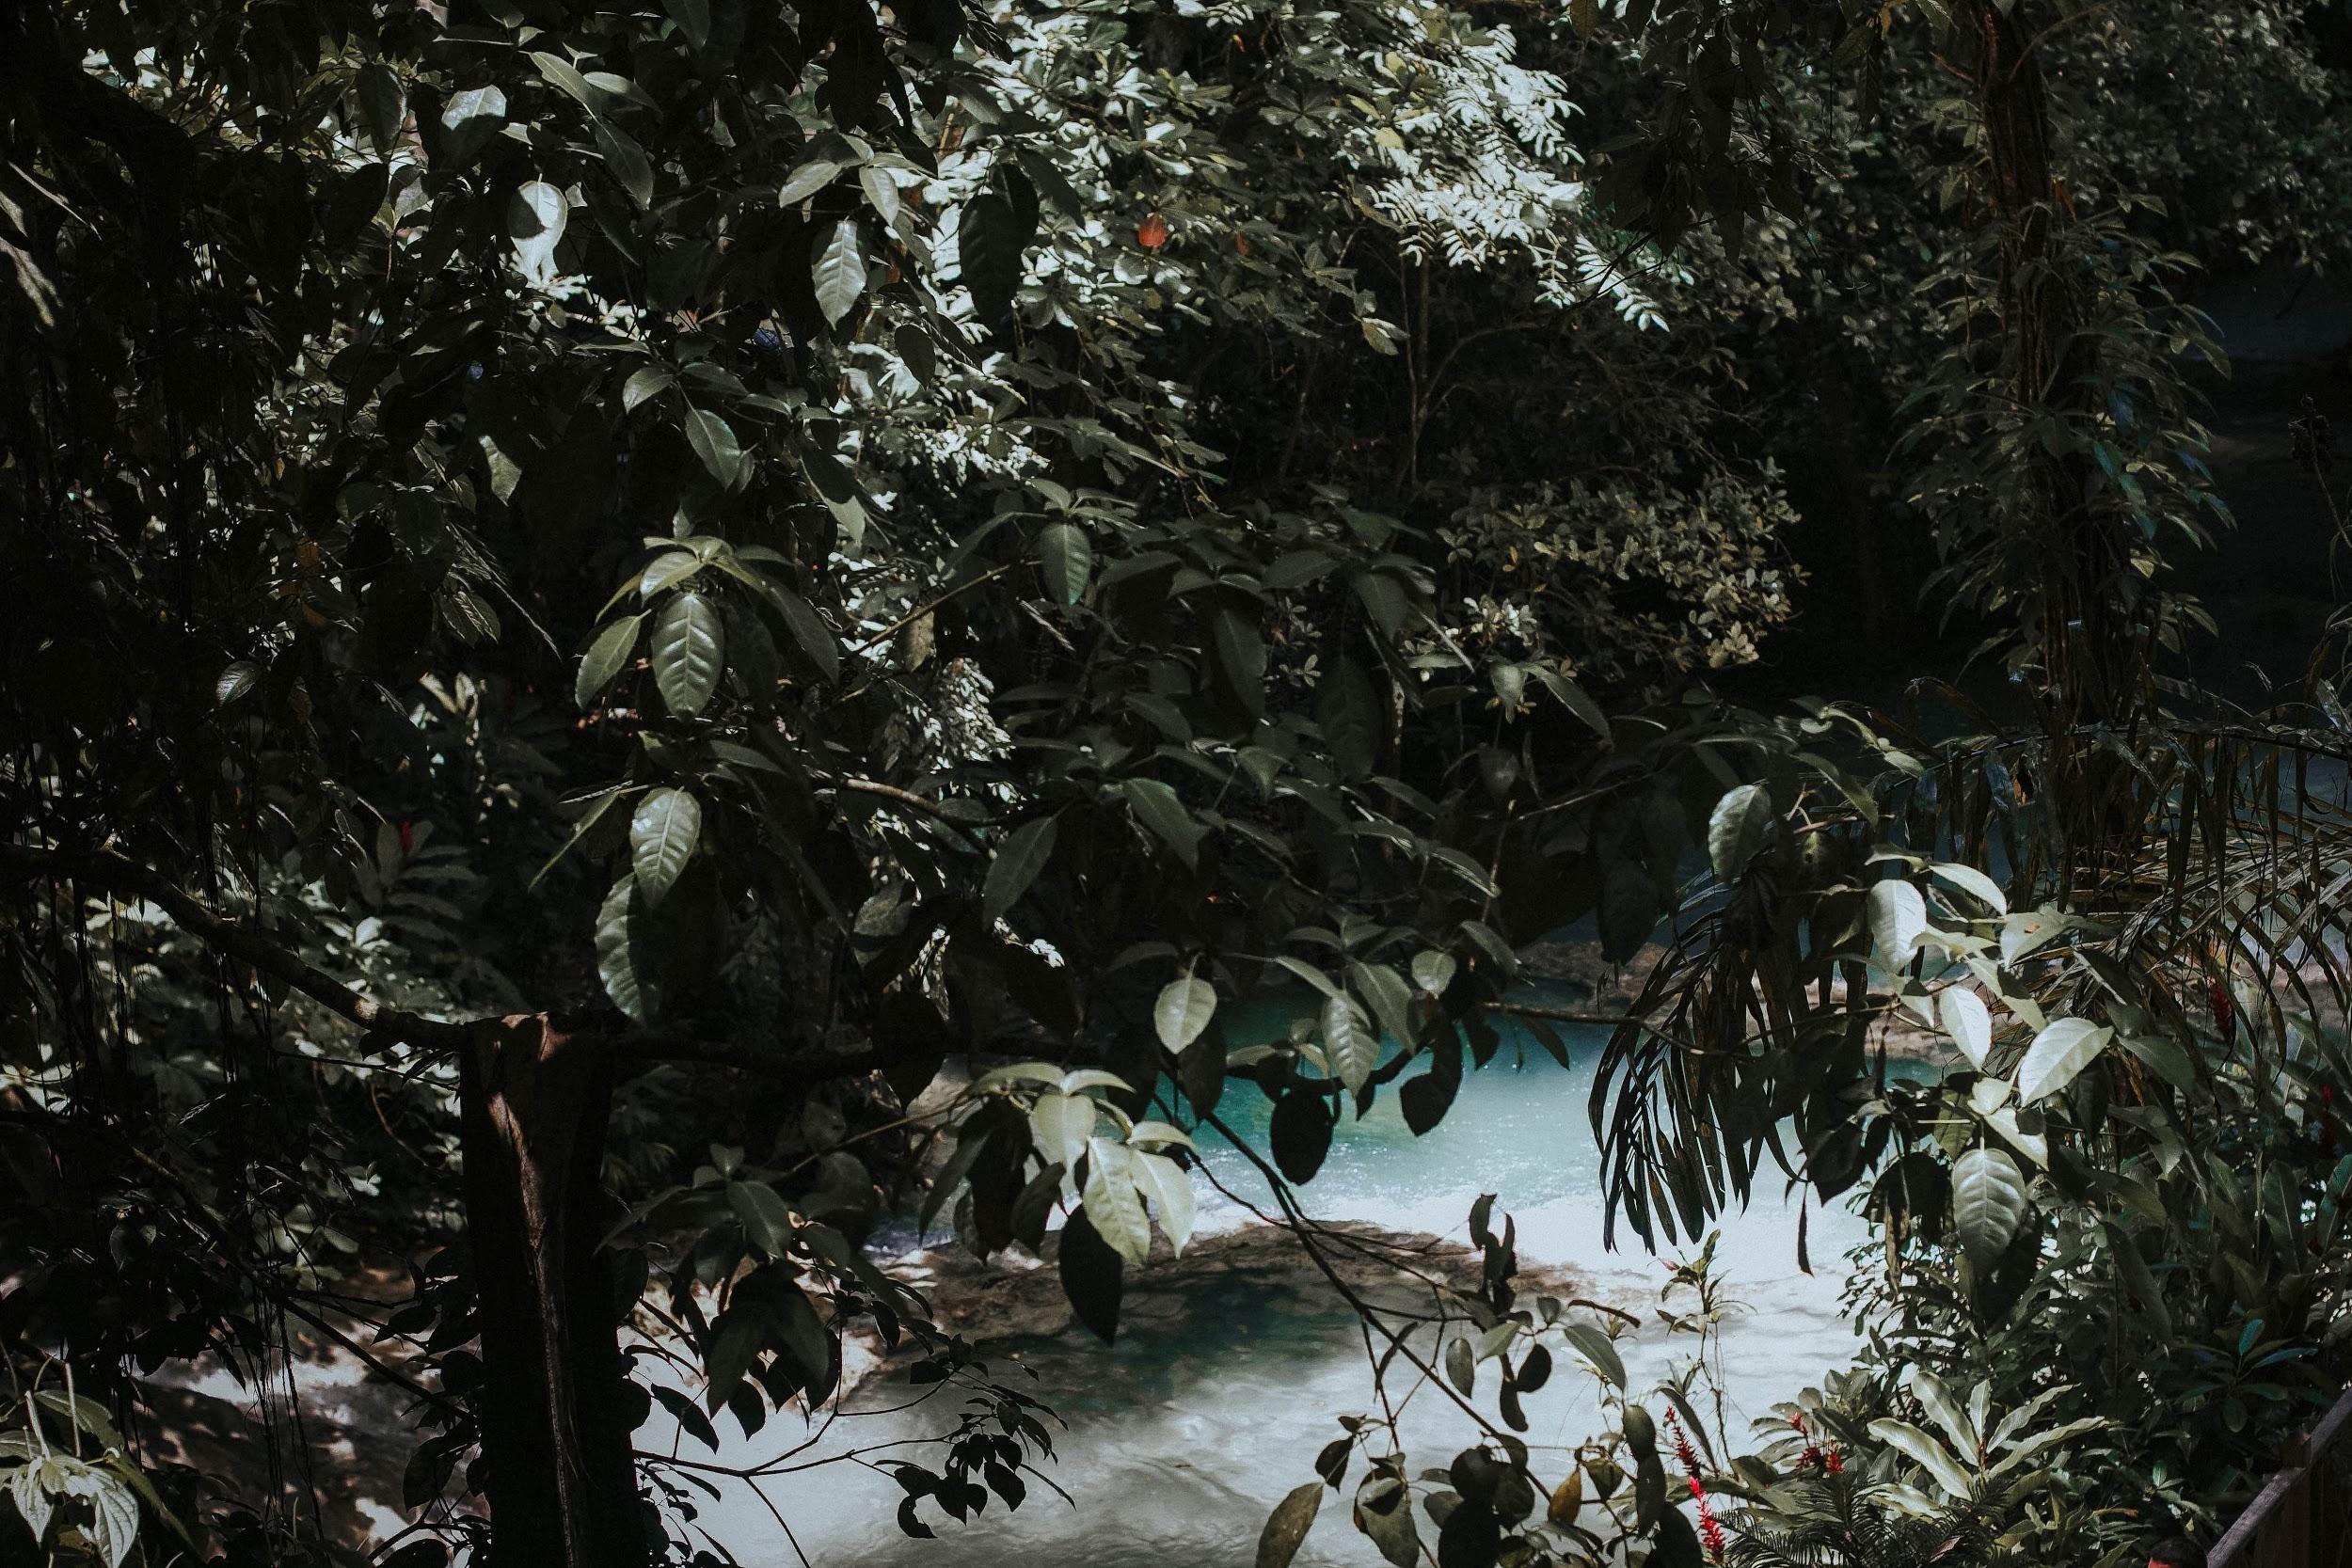 Coffee plants in Jamaica